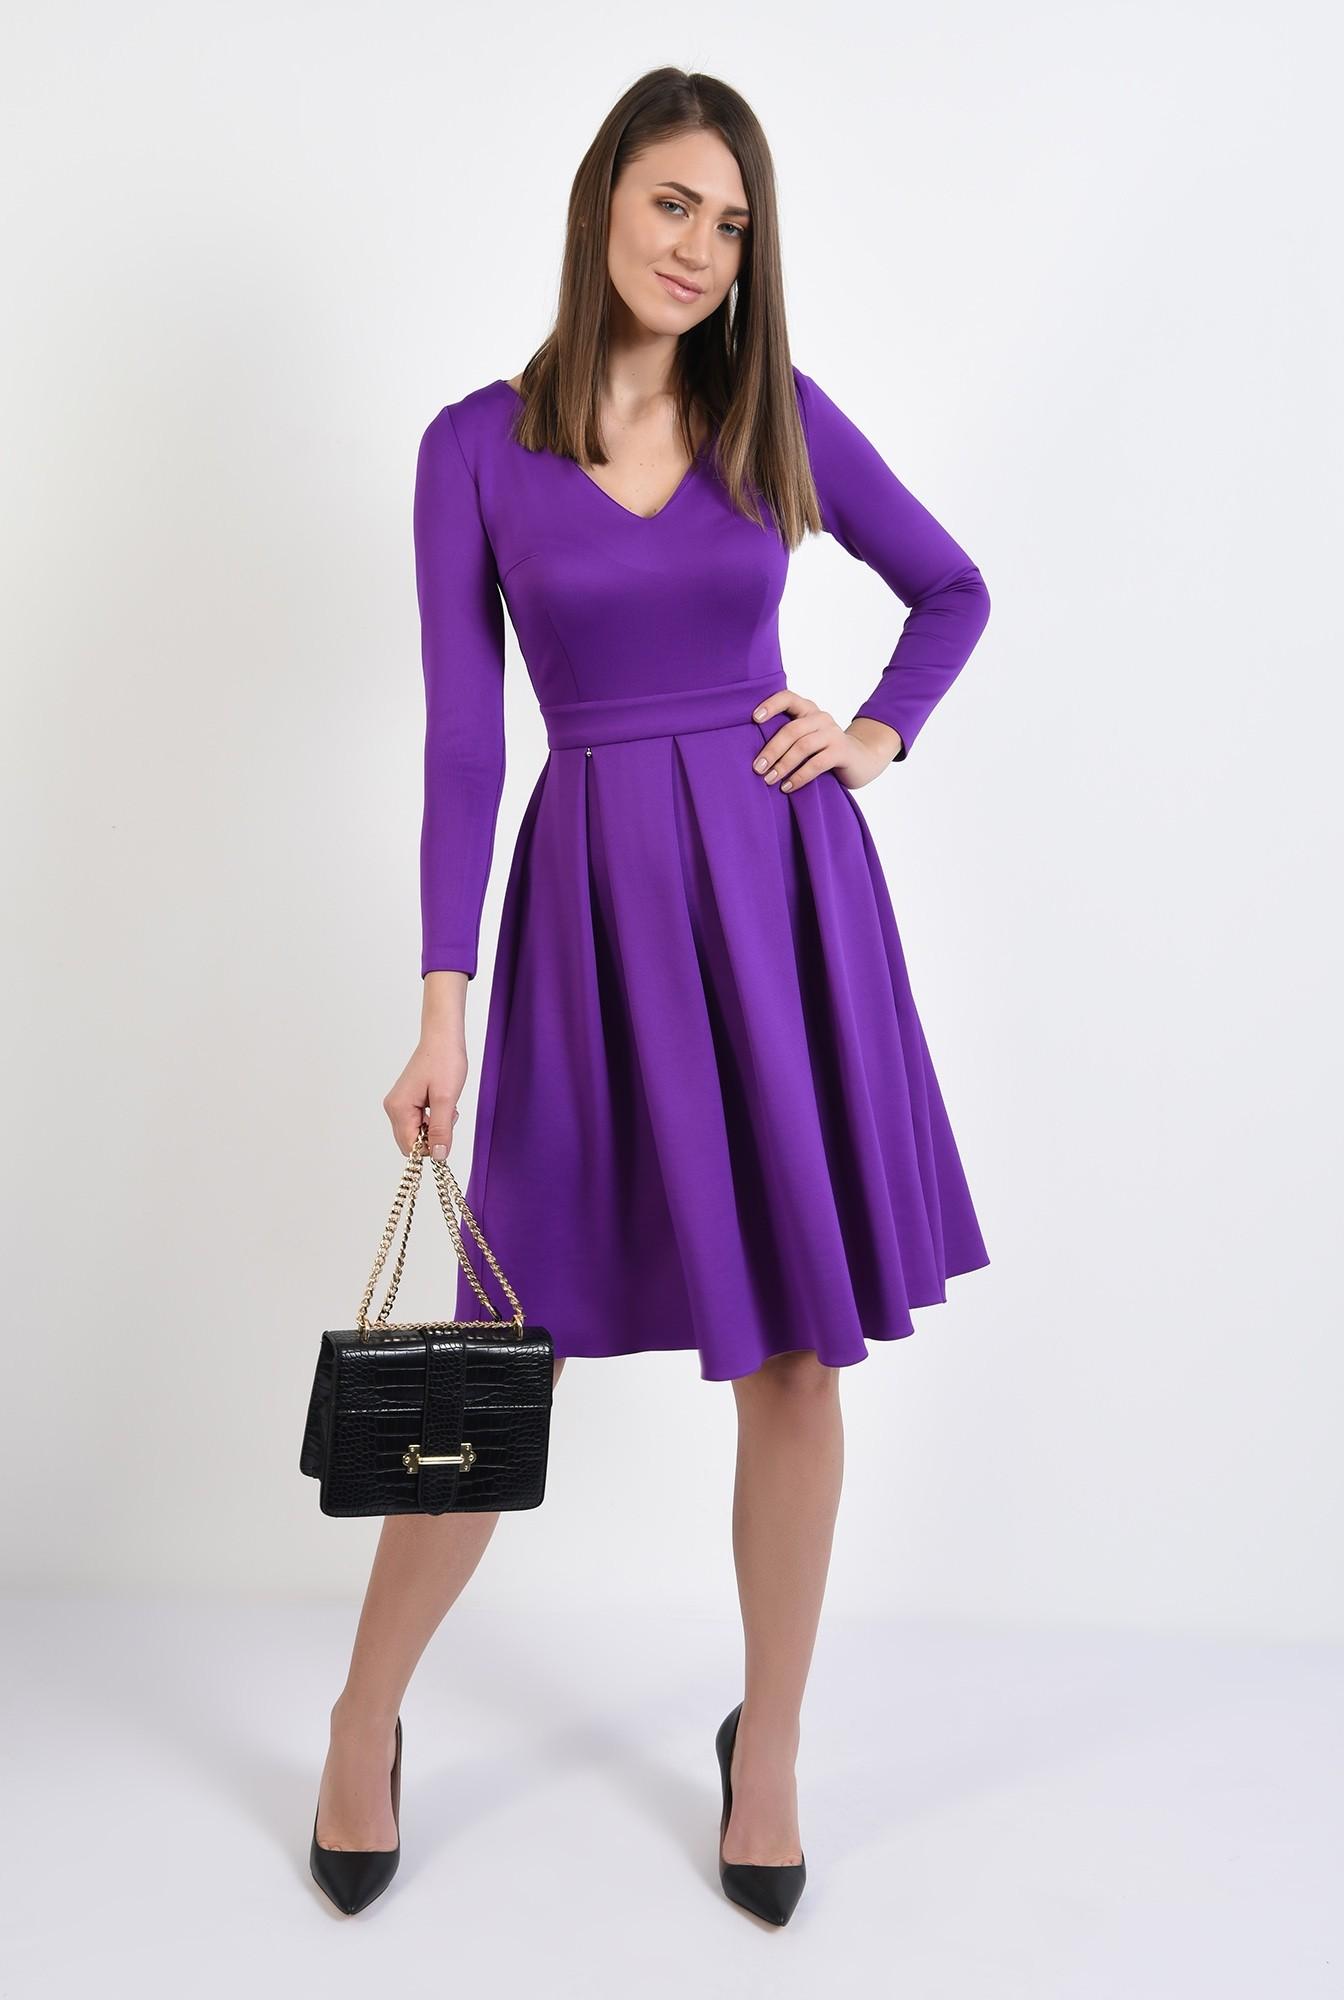 3 - rochie eleganta, evazata, mov, cu pliuri late, maneci stretch